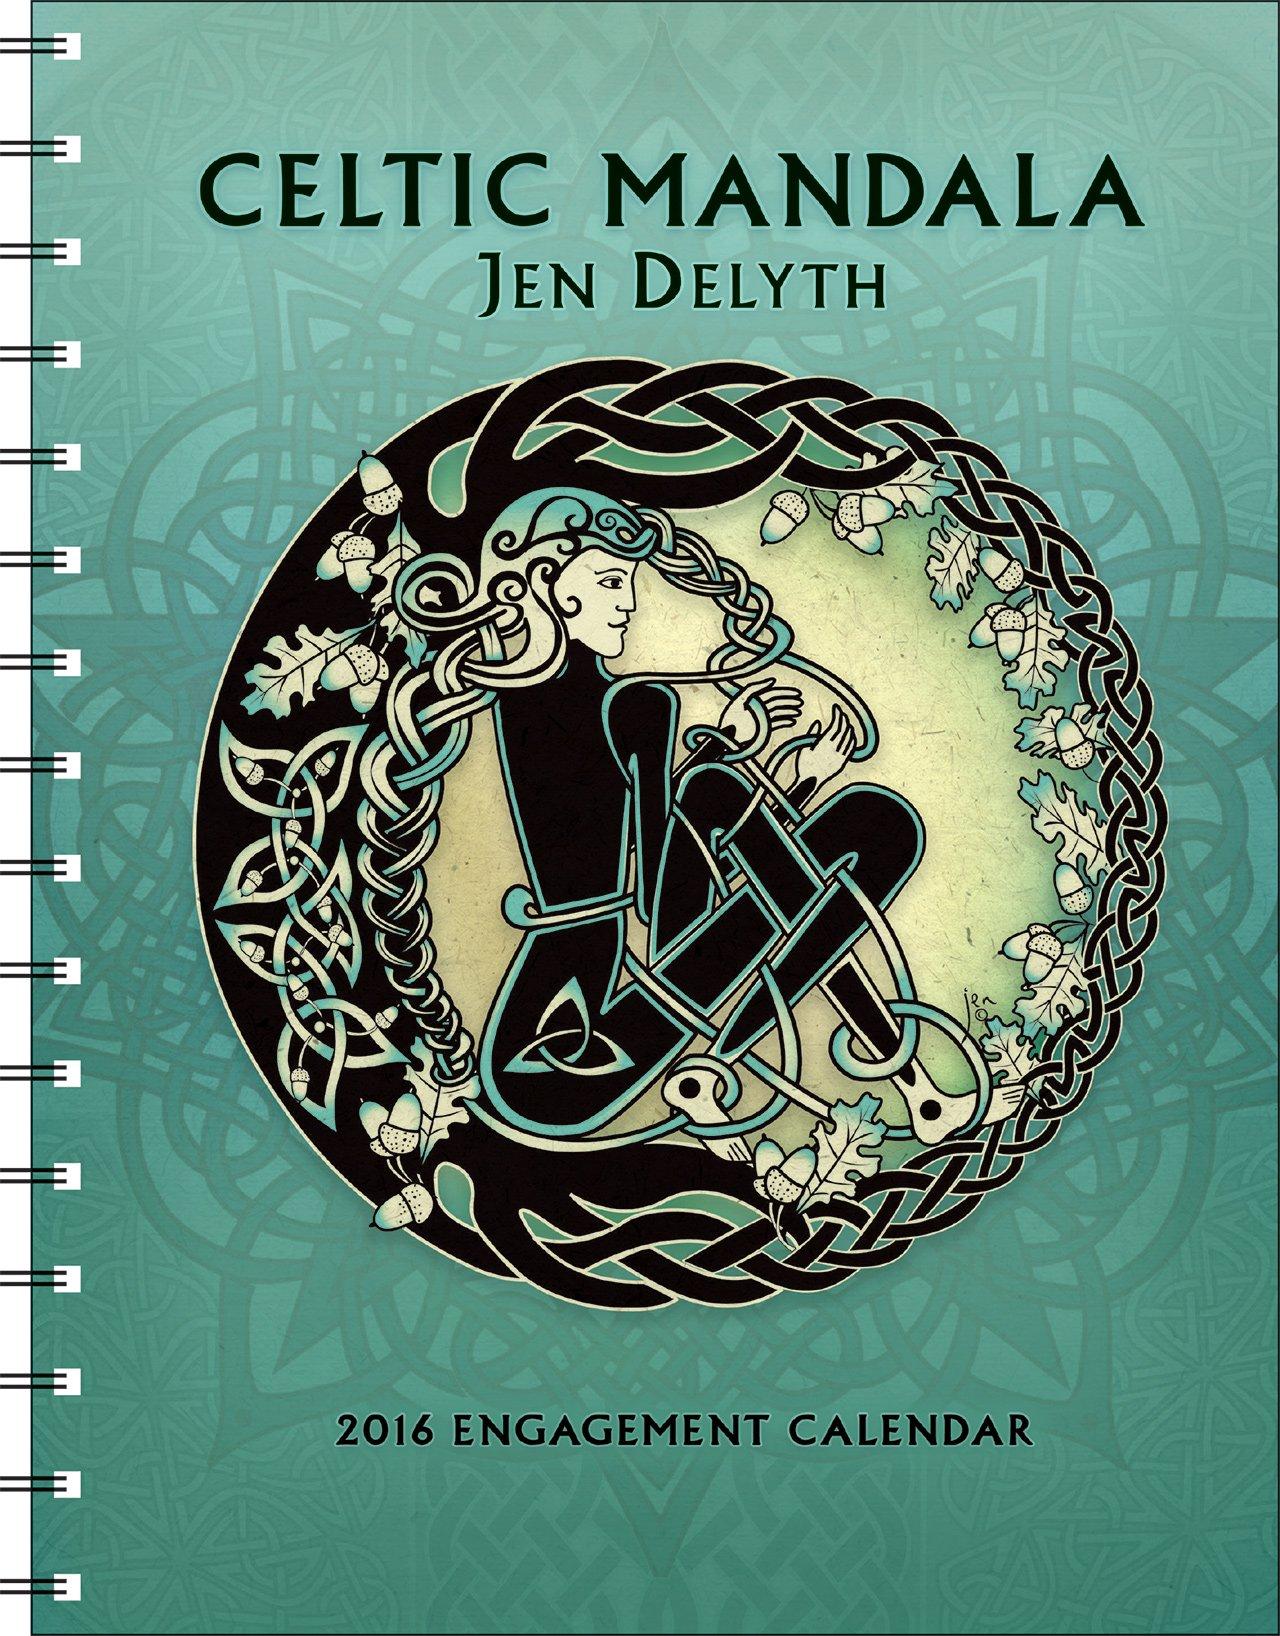 Owl greeting card set welsh artist jen delyth celtic art studio - Celtic Mandala 2016 Engagement Datebook Calendar